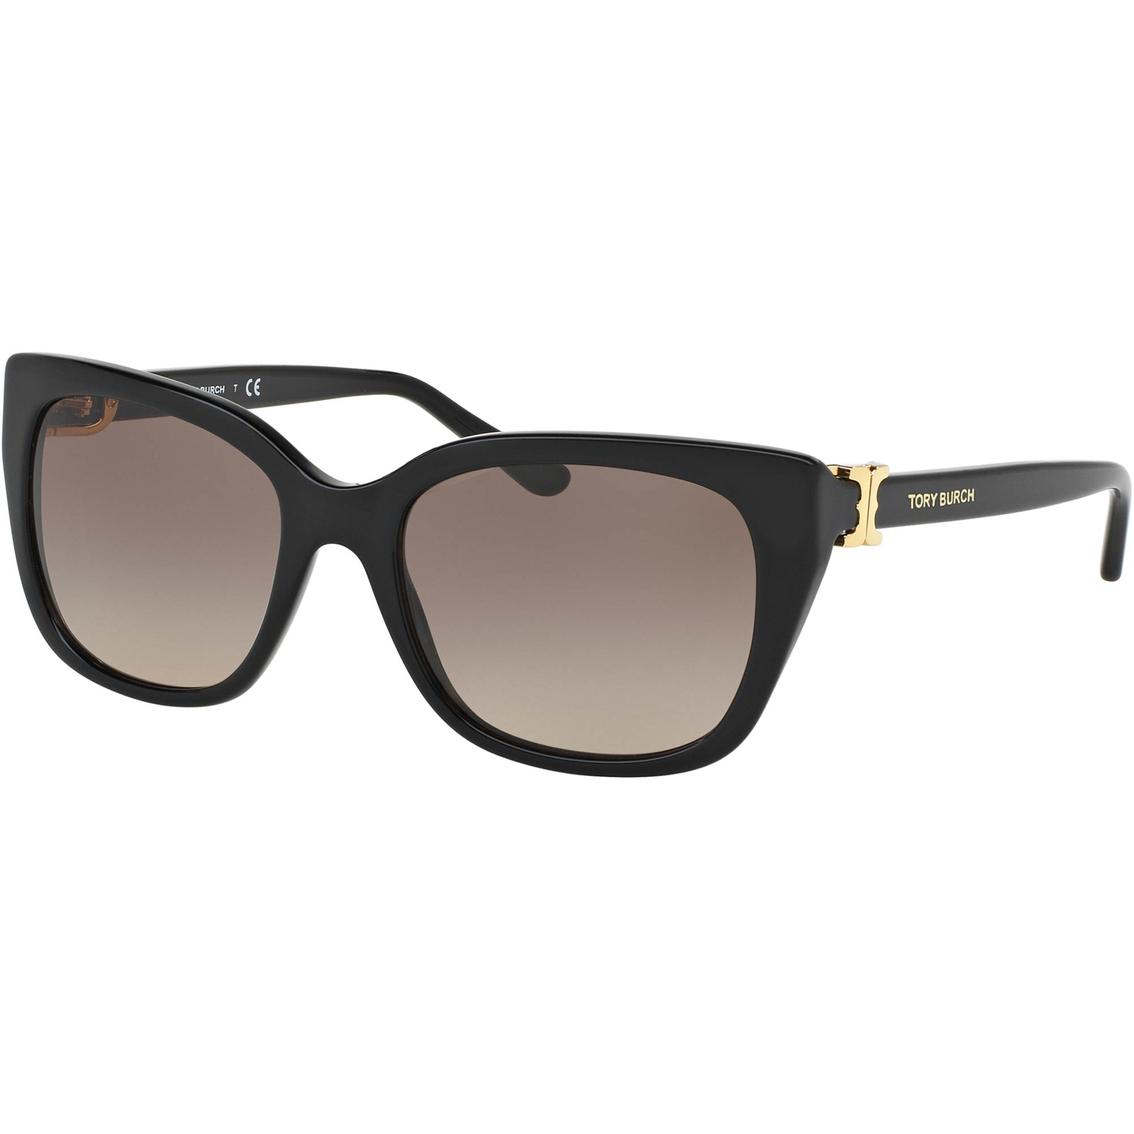 7f455dcbdf8 Tory Burch Cat Eye Sunglasses 0ty7099